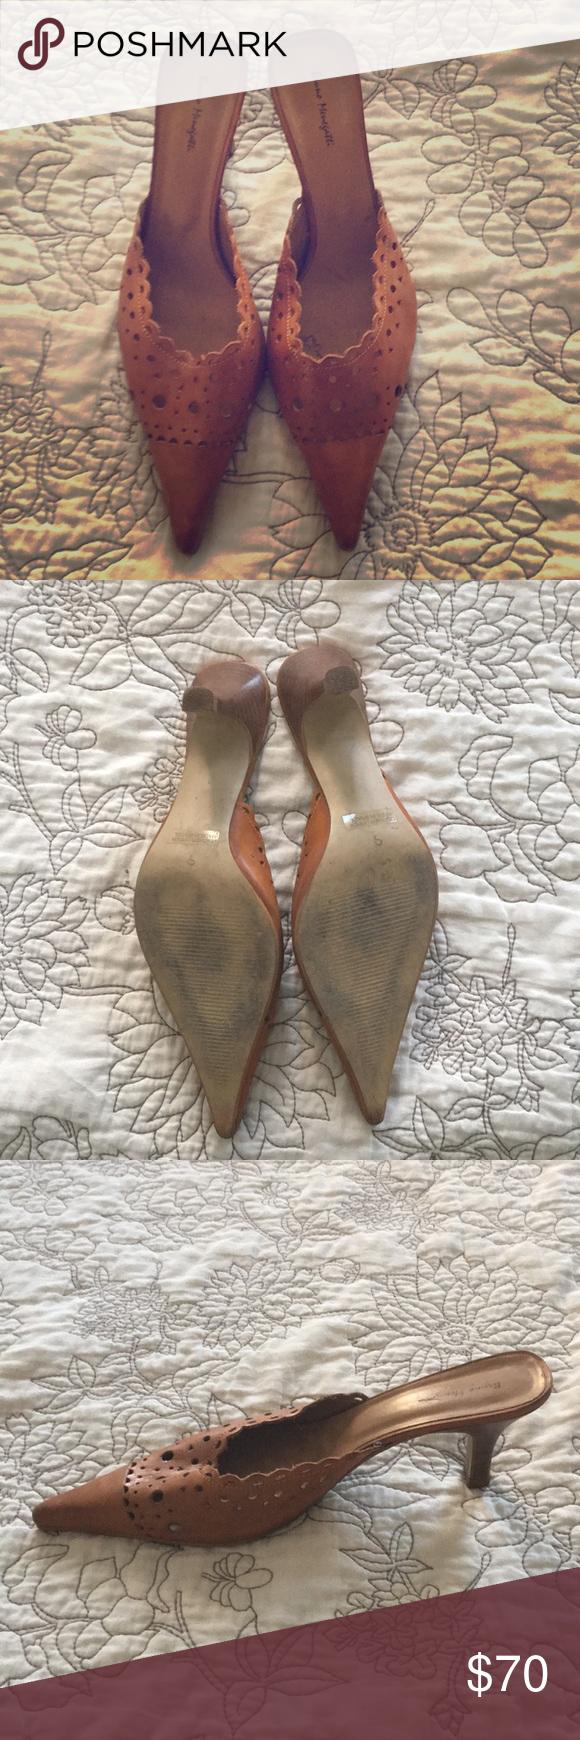 Bruno menegatti casualfancy shoes casual heels fancy shoes and fancy